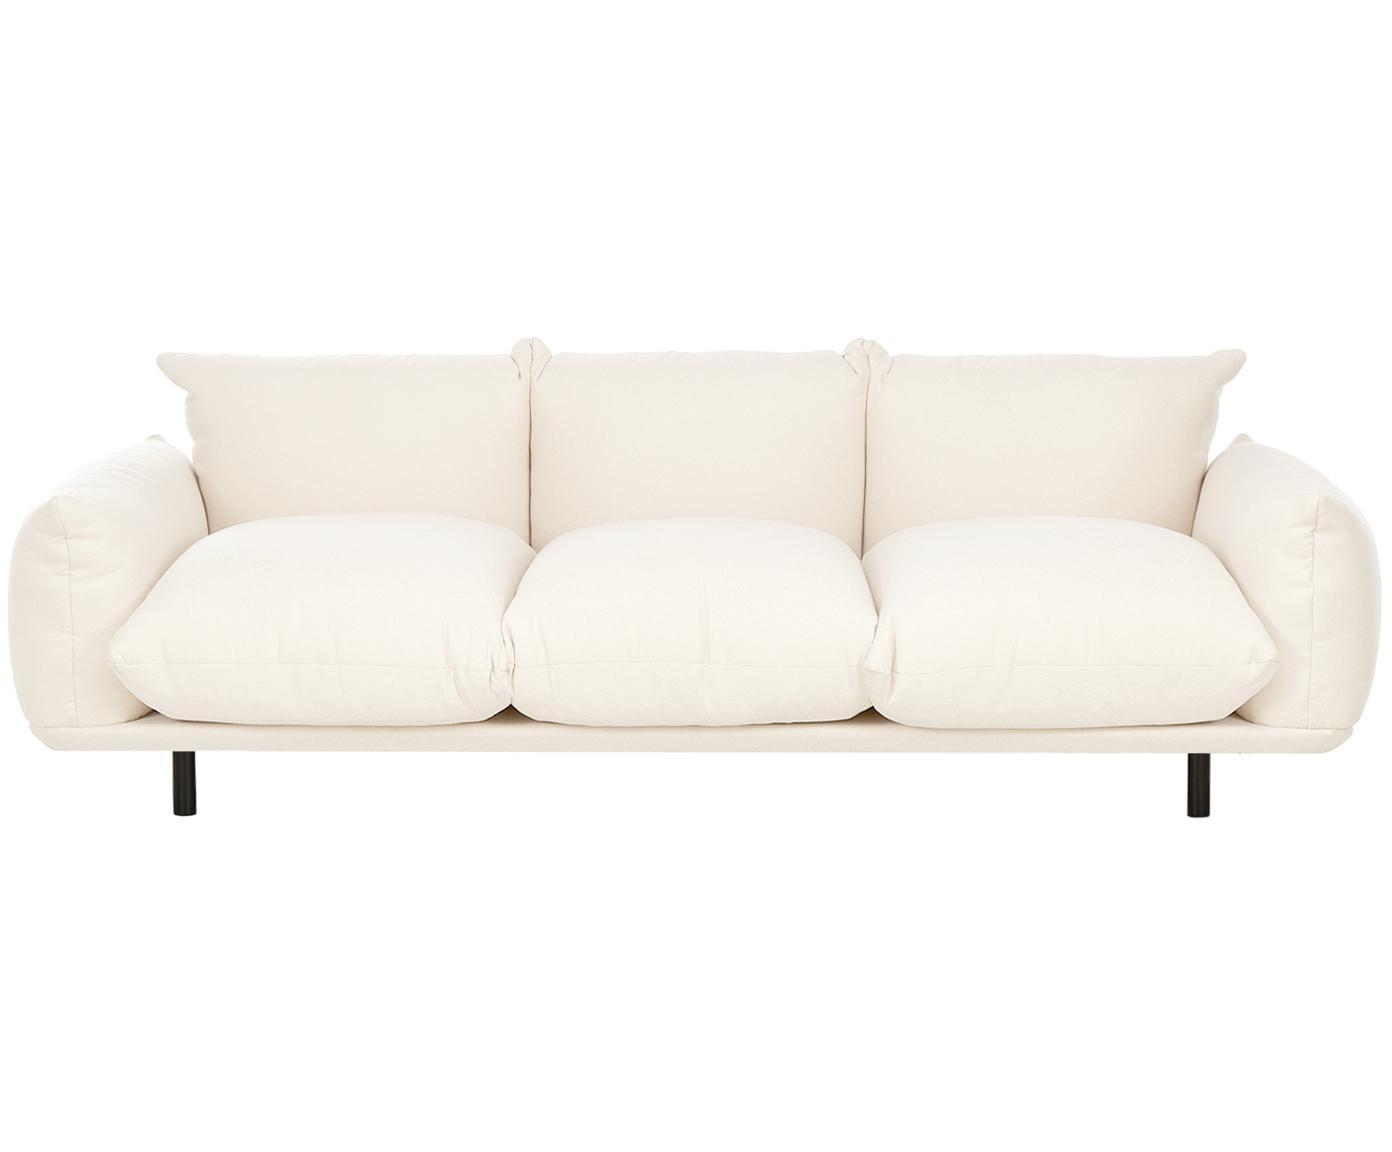 Sofa Saga (3-Sitzer), Bezug: 100% Polyester 35.000 Sch, Gestell: Massives Birkenholz, Füße: Metall, pulverbeschichtet, Webstoff Beige, B 232 x T 103 cm